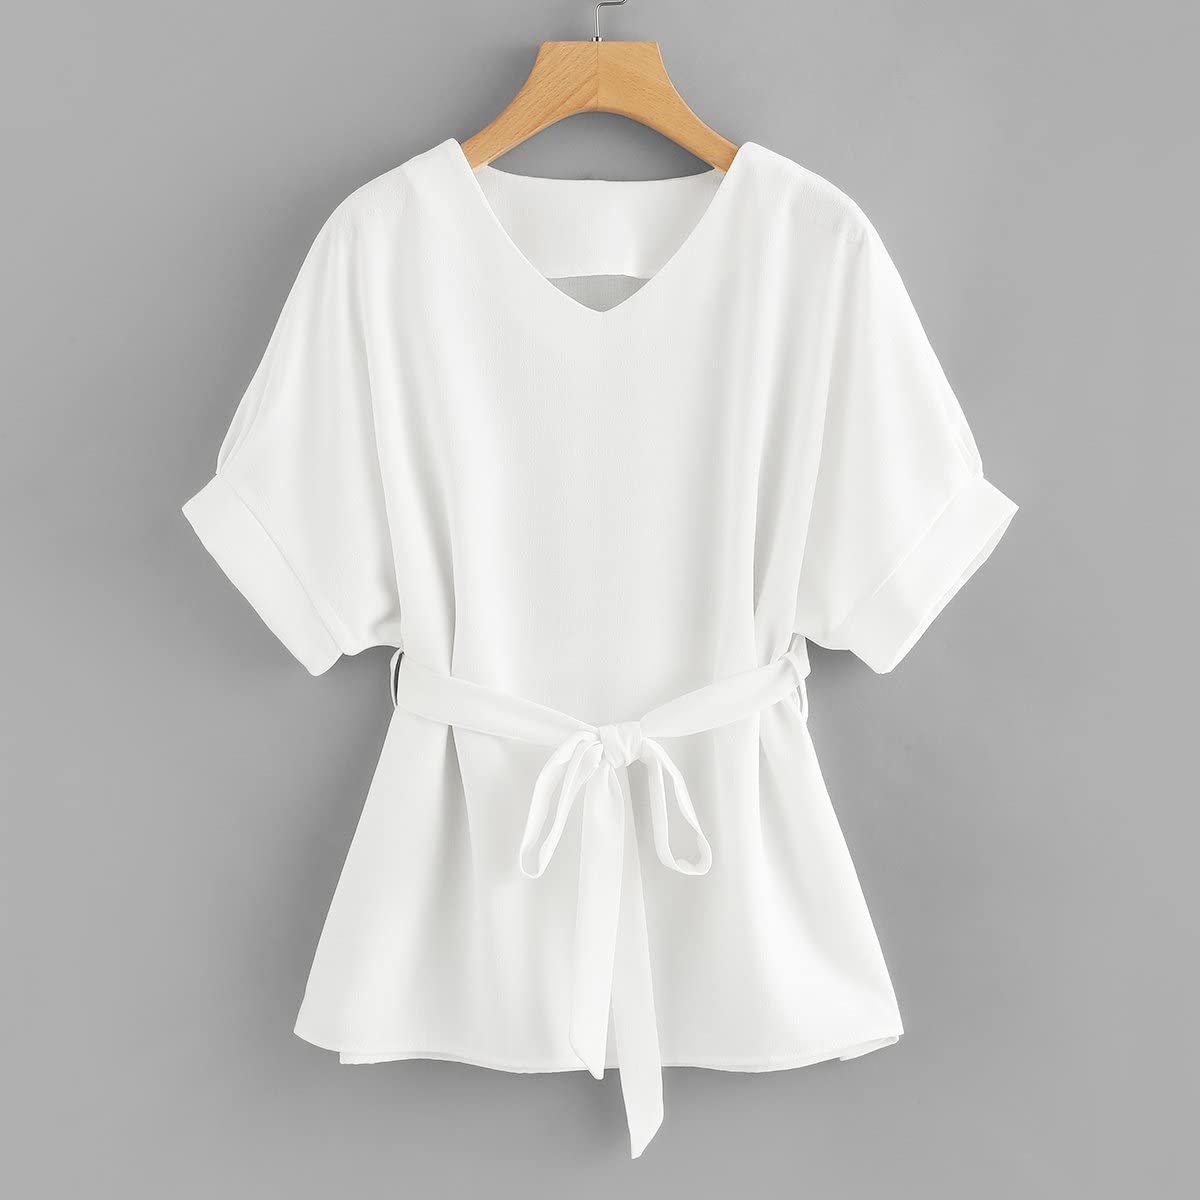 1900 -1910s Edwardian Fashion, Clothing & Costumes Milumia Womens Casual V Neckline Short Sleeve Self Tie Dressy Work Blouse Tunic Tops  AT vintagedancer.com